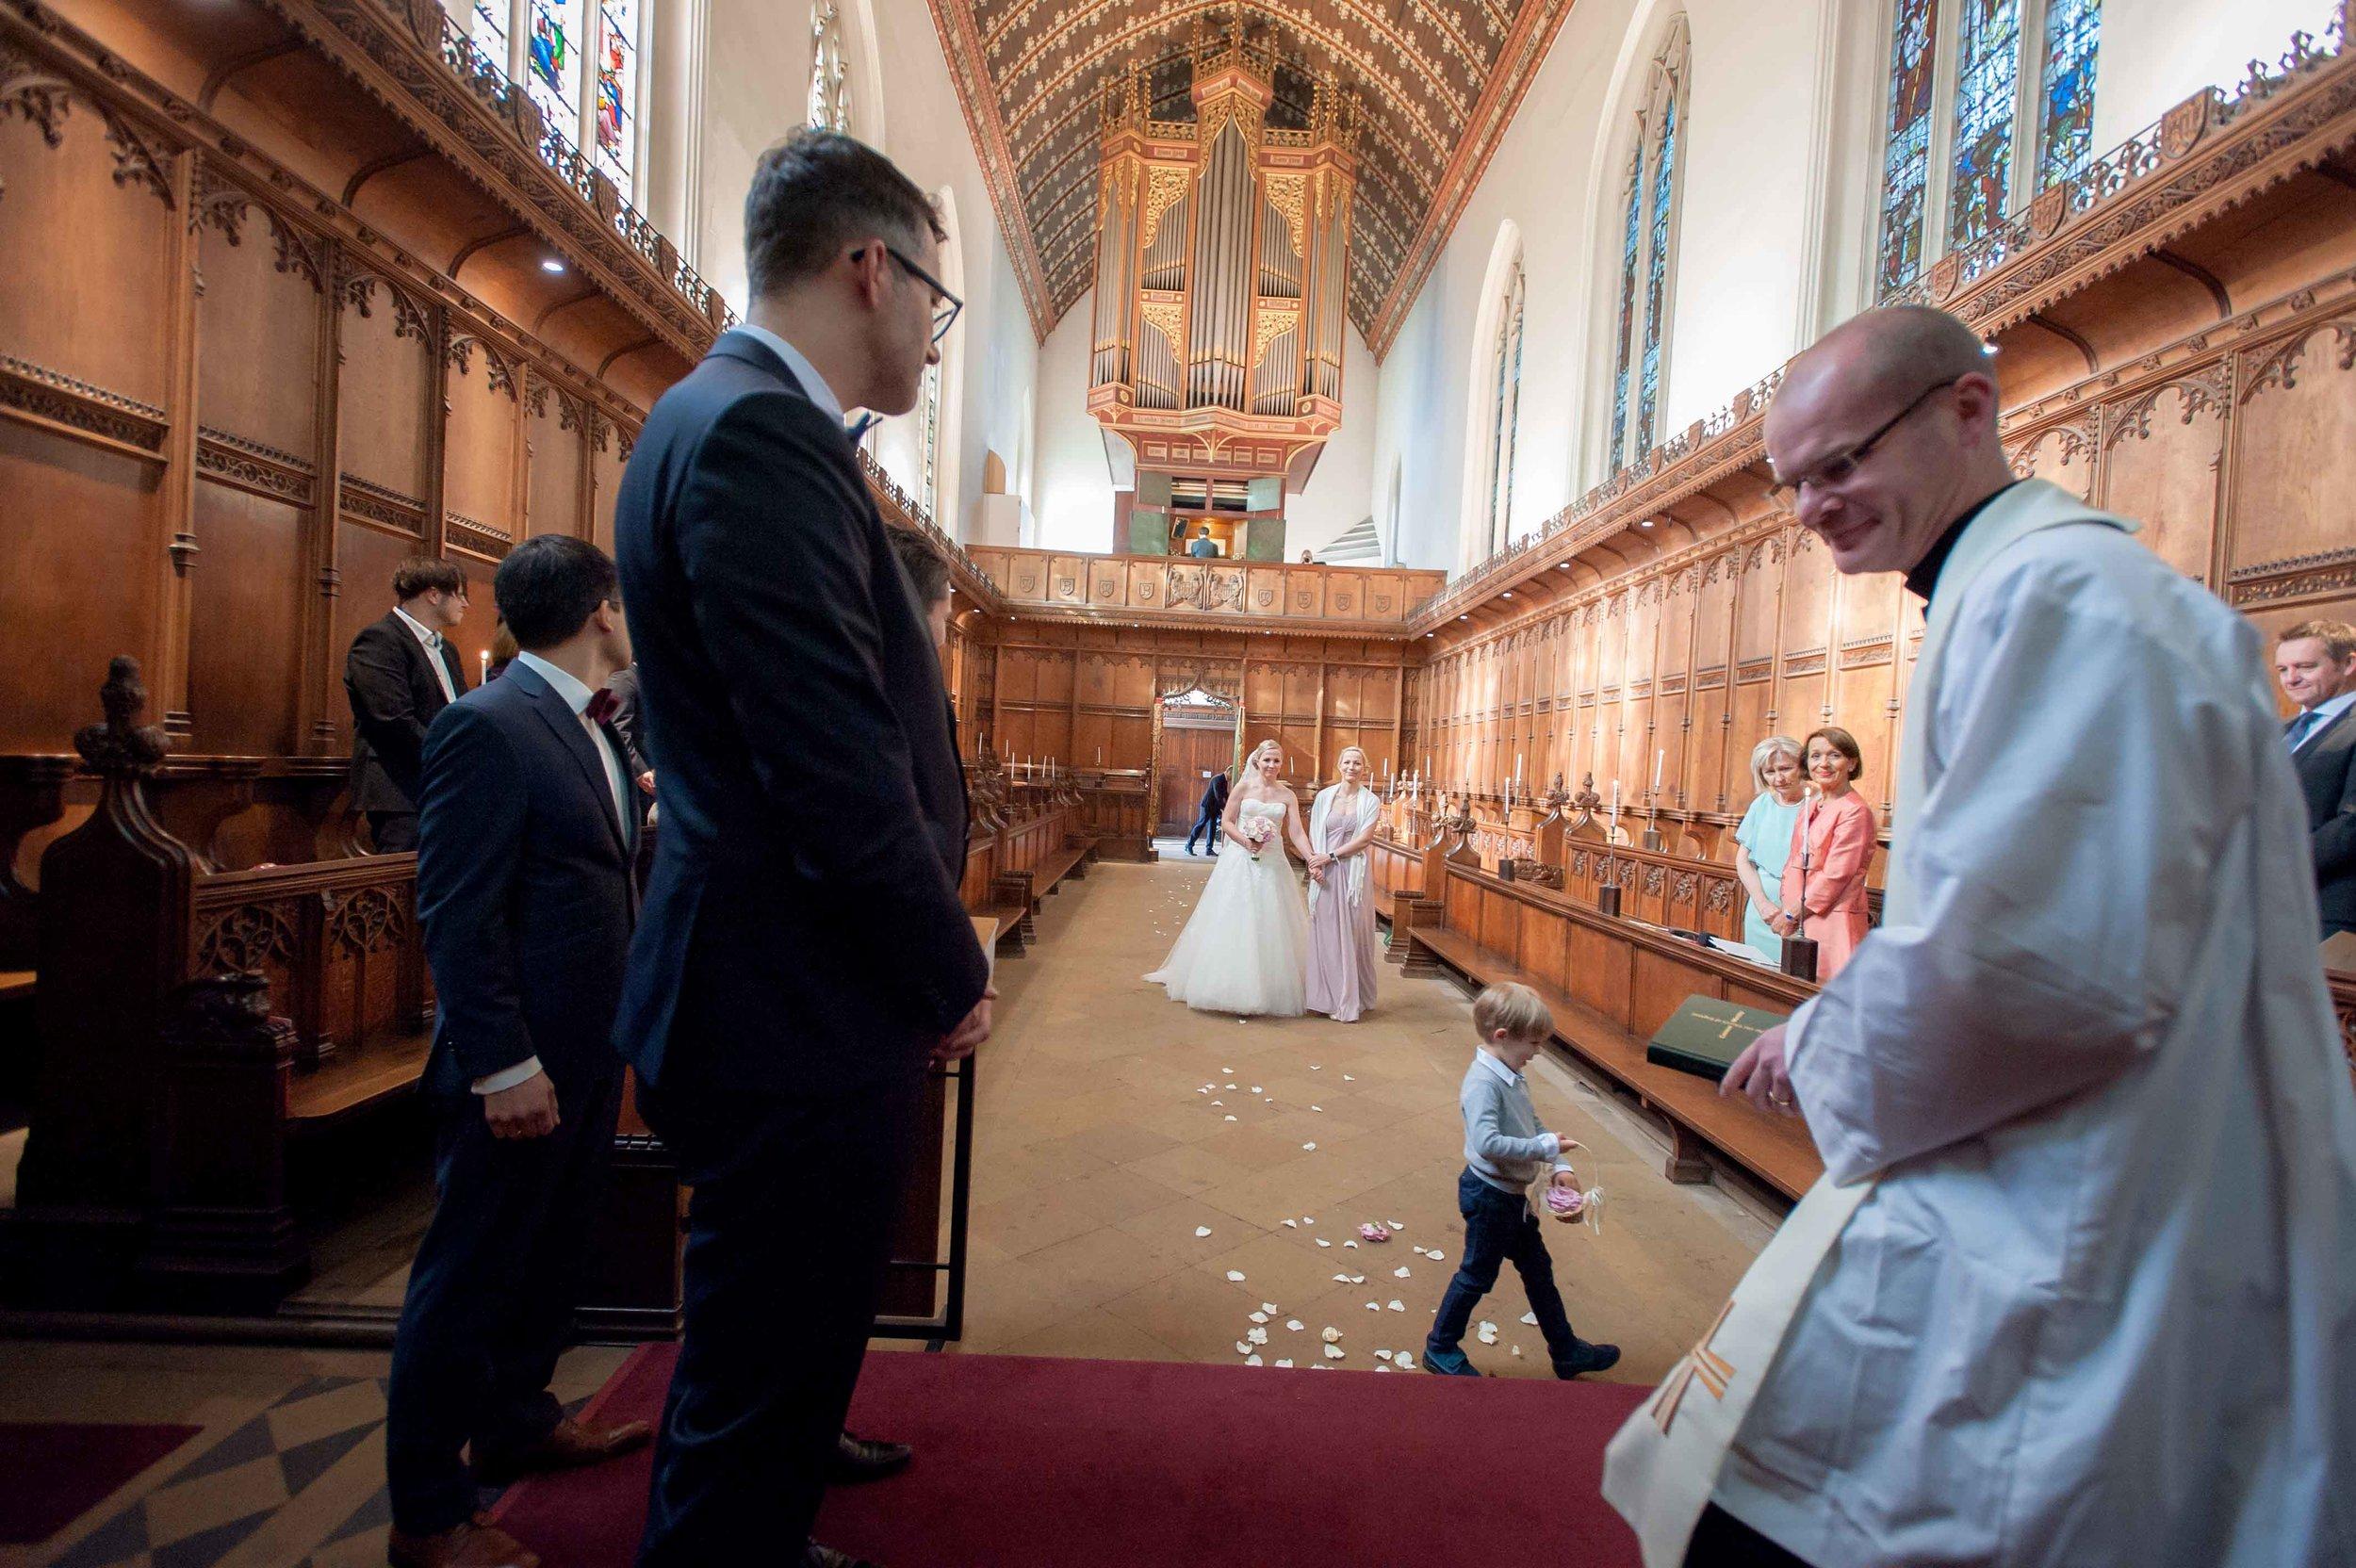 Adrian_Nicole_Charnwood_Weddings_Queens_College_Cambridge-1015.jpg